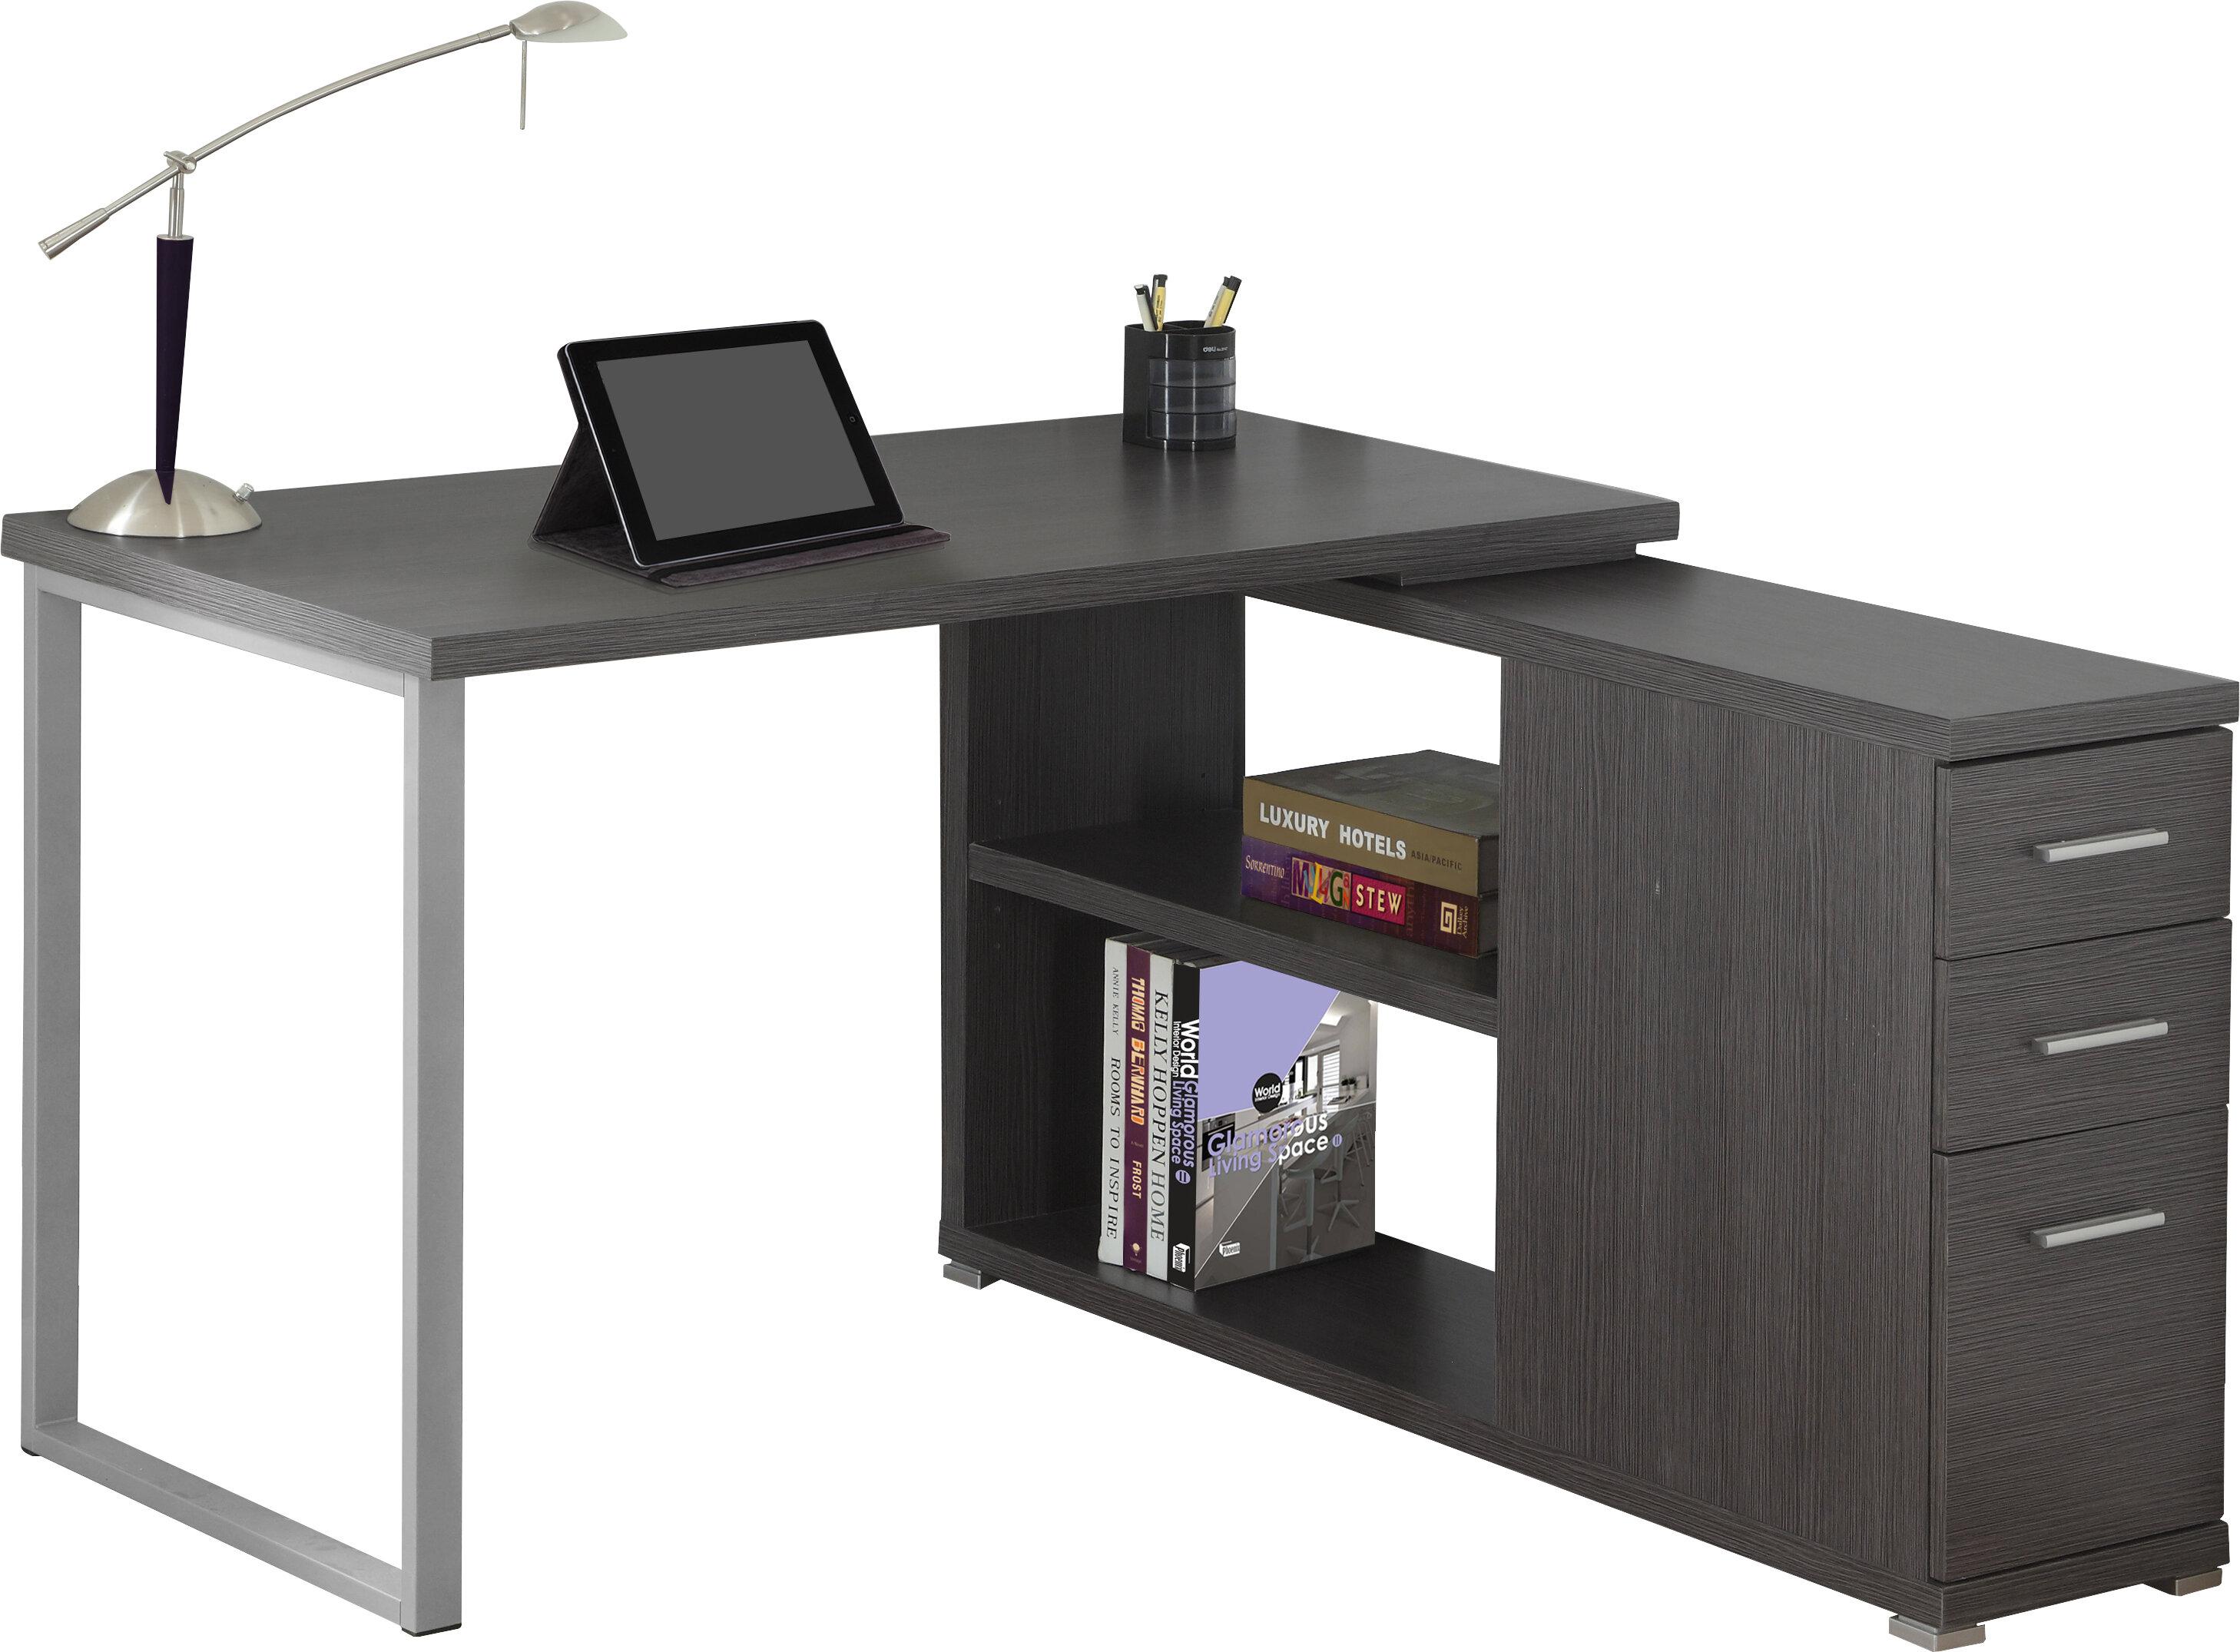 bookcase core monarch inch specialties black grey bookcases walmart ip com hollow and